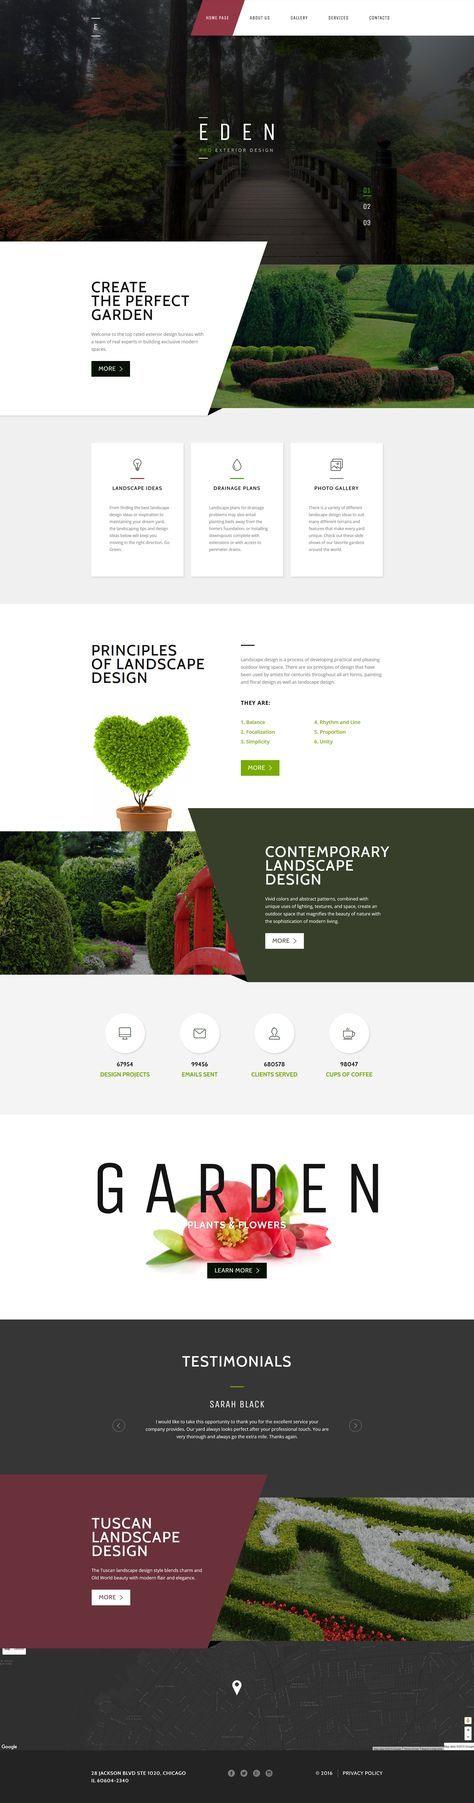 Garden Design Responsive Website Template #58440 http://www.templatemonster.com/website-templates/garden-design-responsive-website-template-58440.html #html #html5